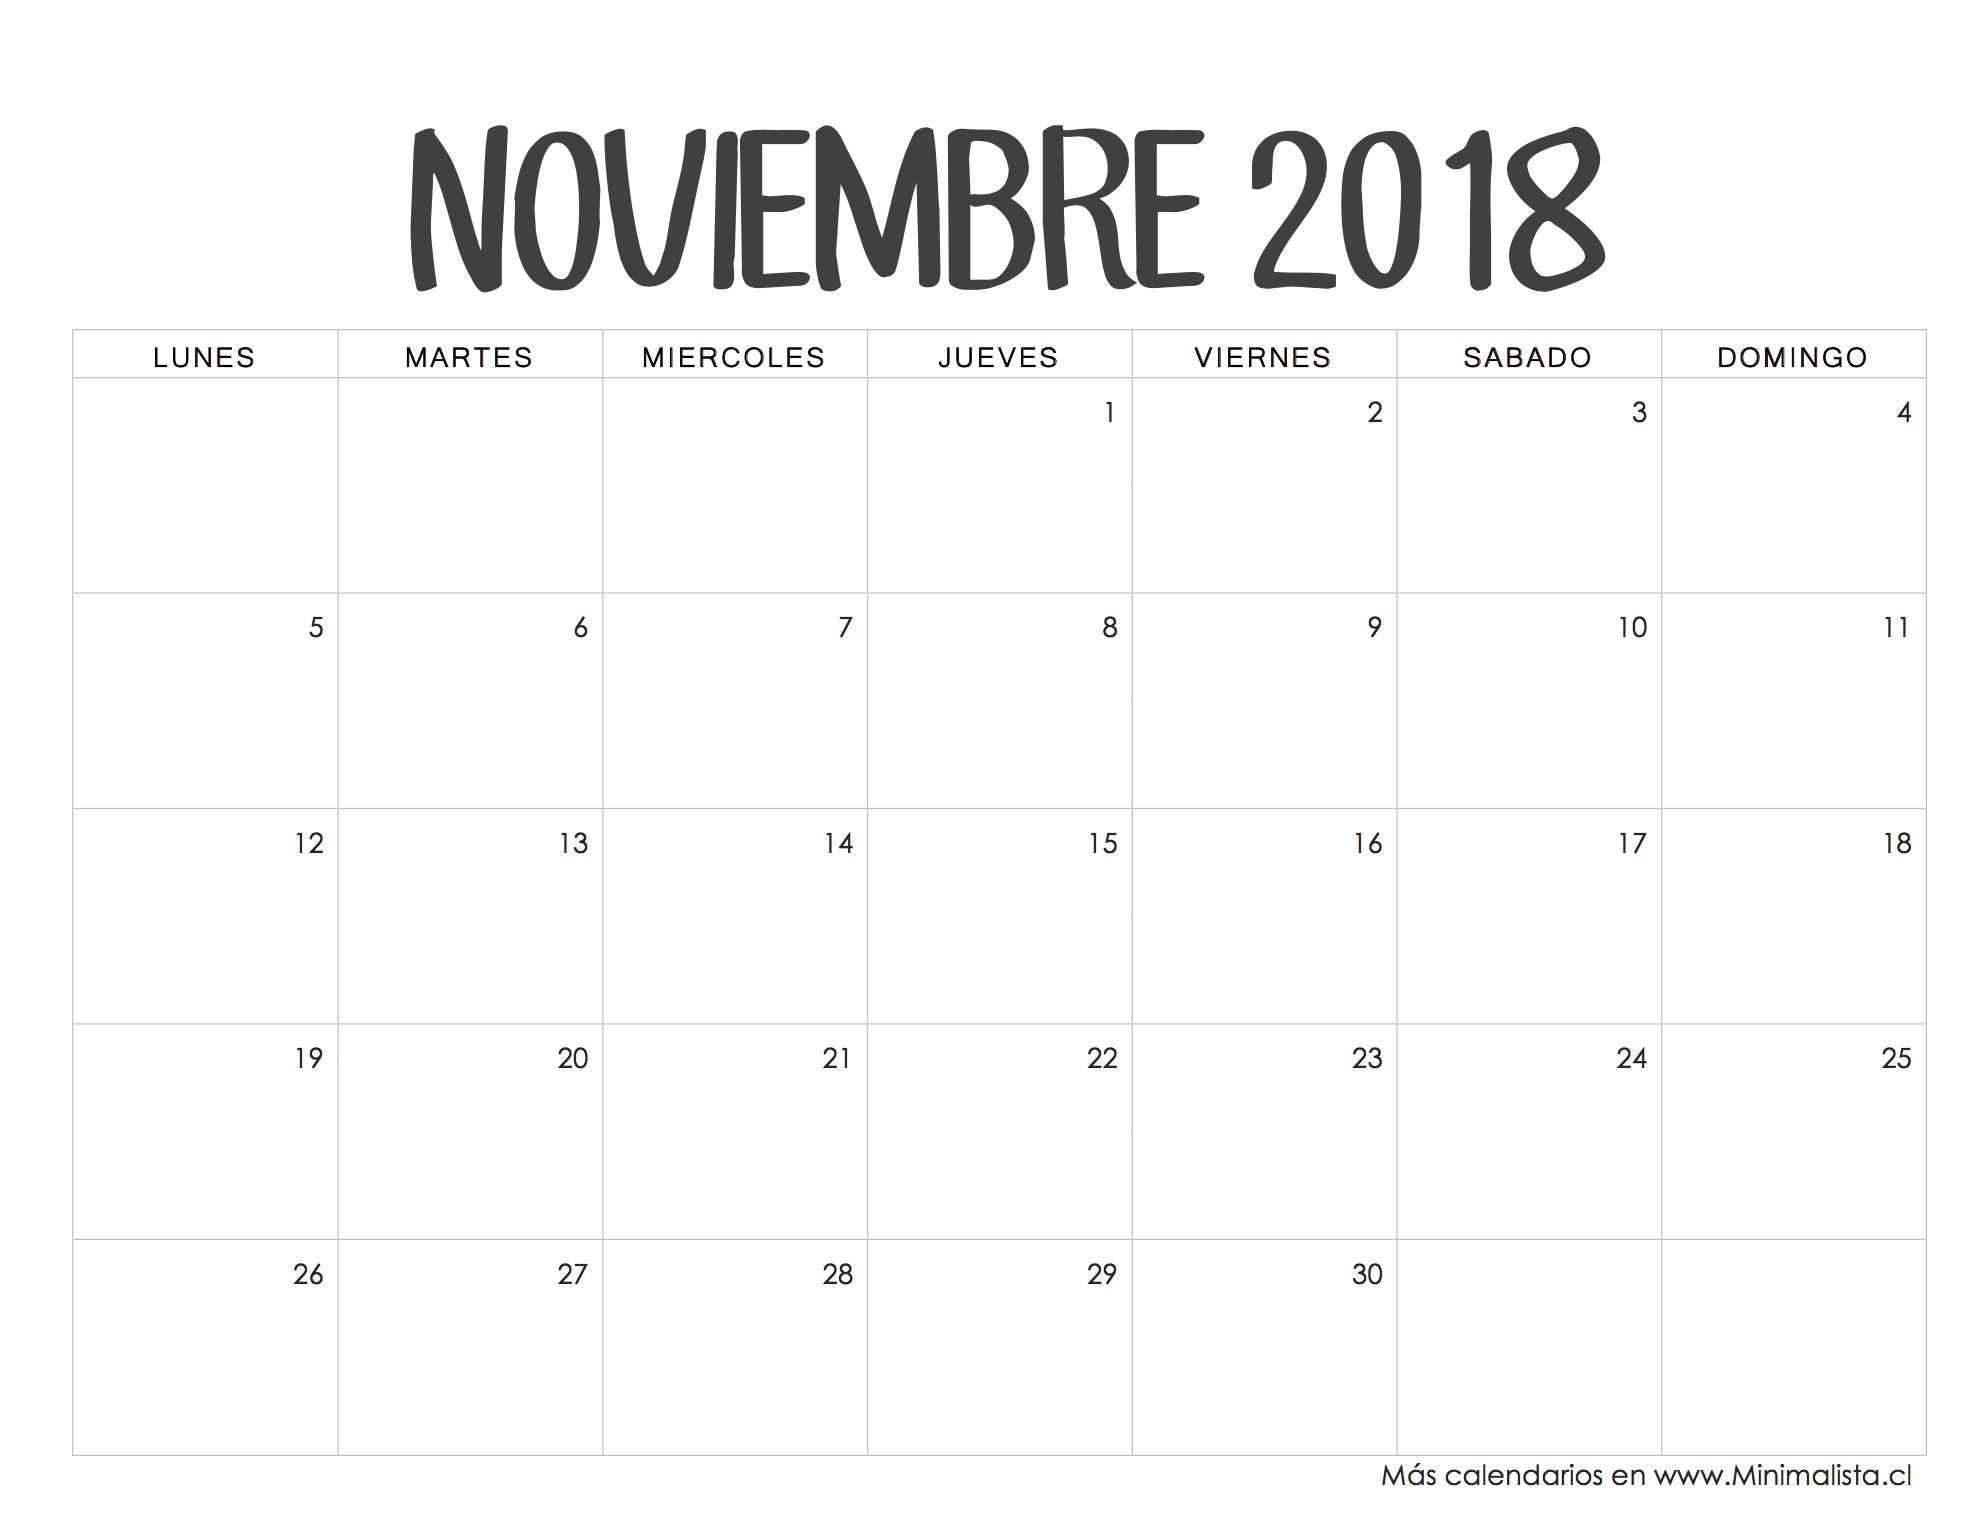 Calendario Noviembre 2018 fondos